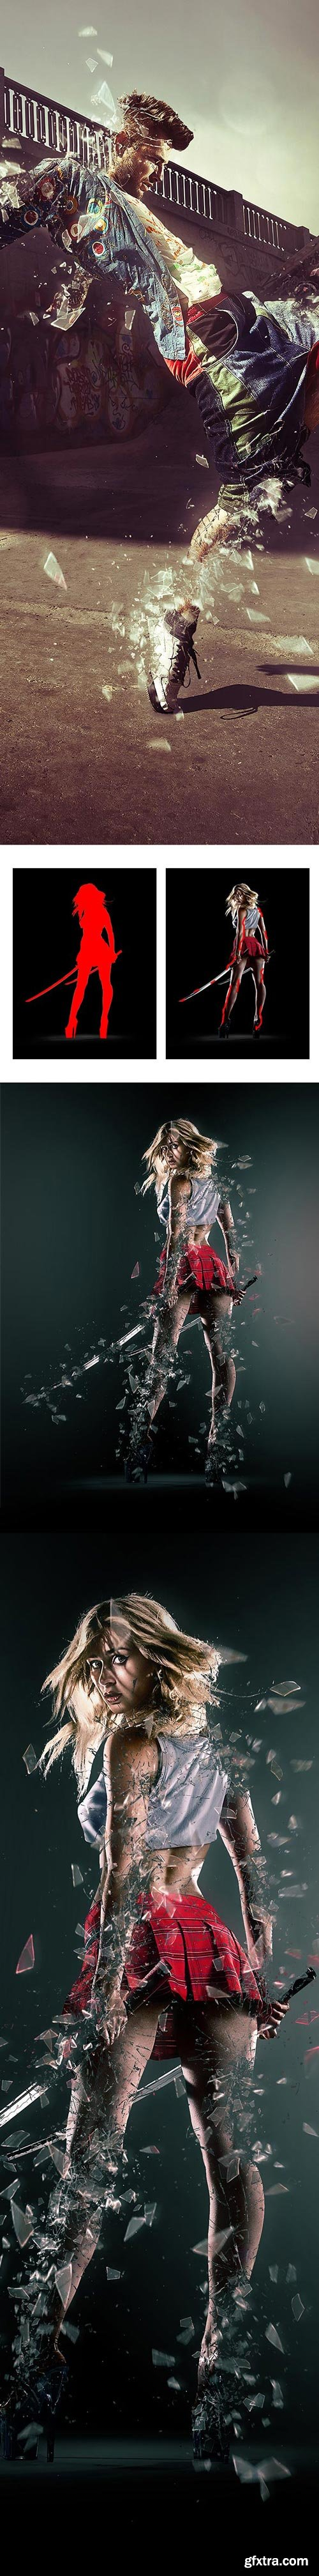 GraphicRiver - Broken Photoshop Action - 14672433